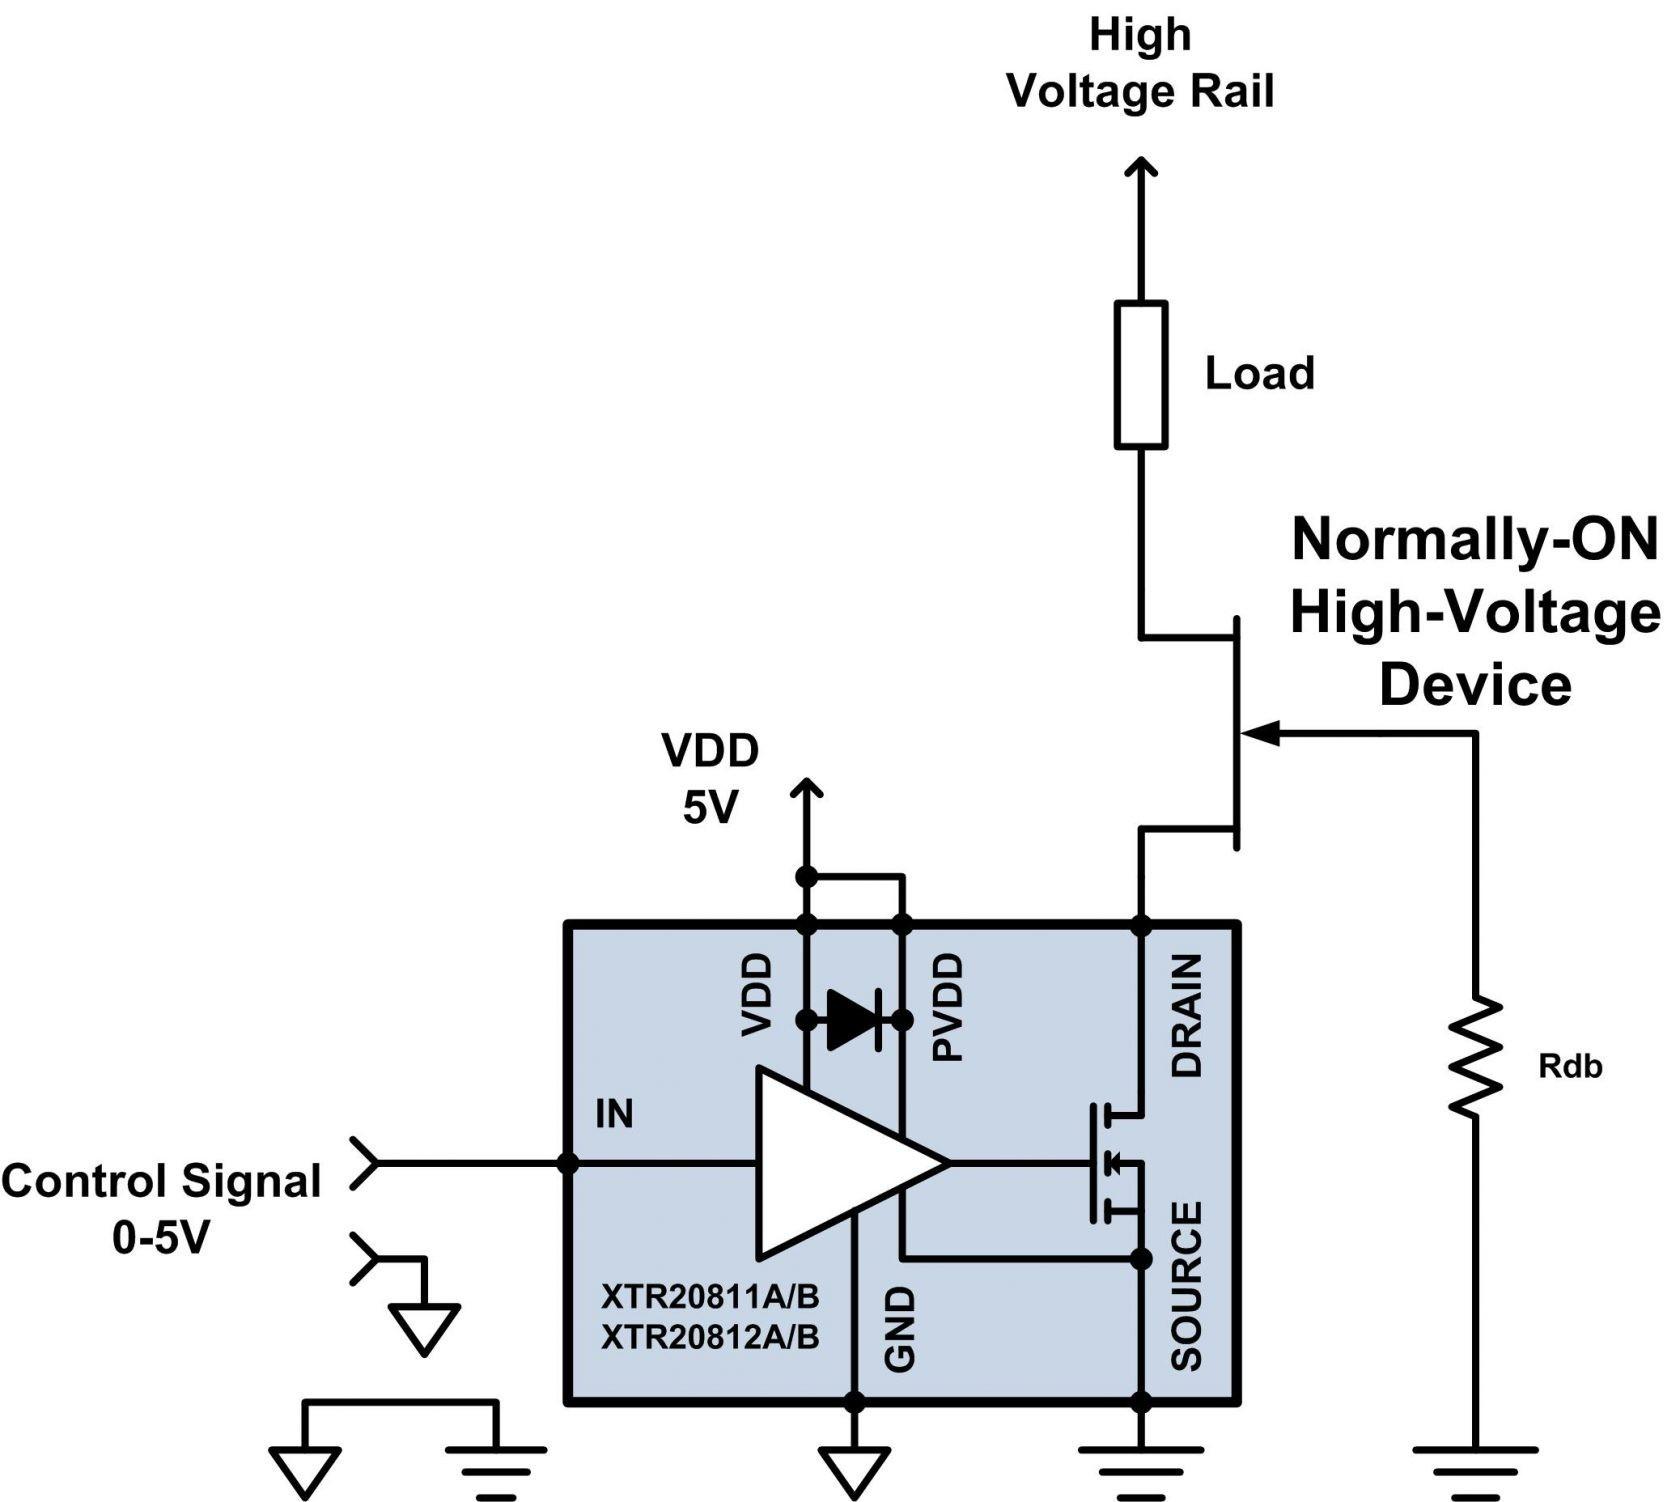 Delco Alternator Wiring Diagram External Regulator Copy Gm In